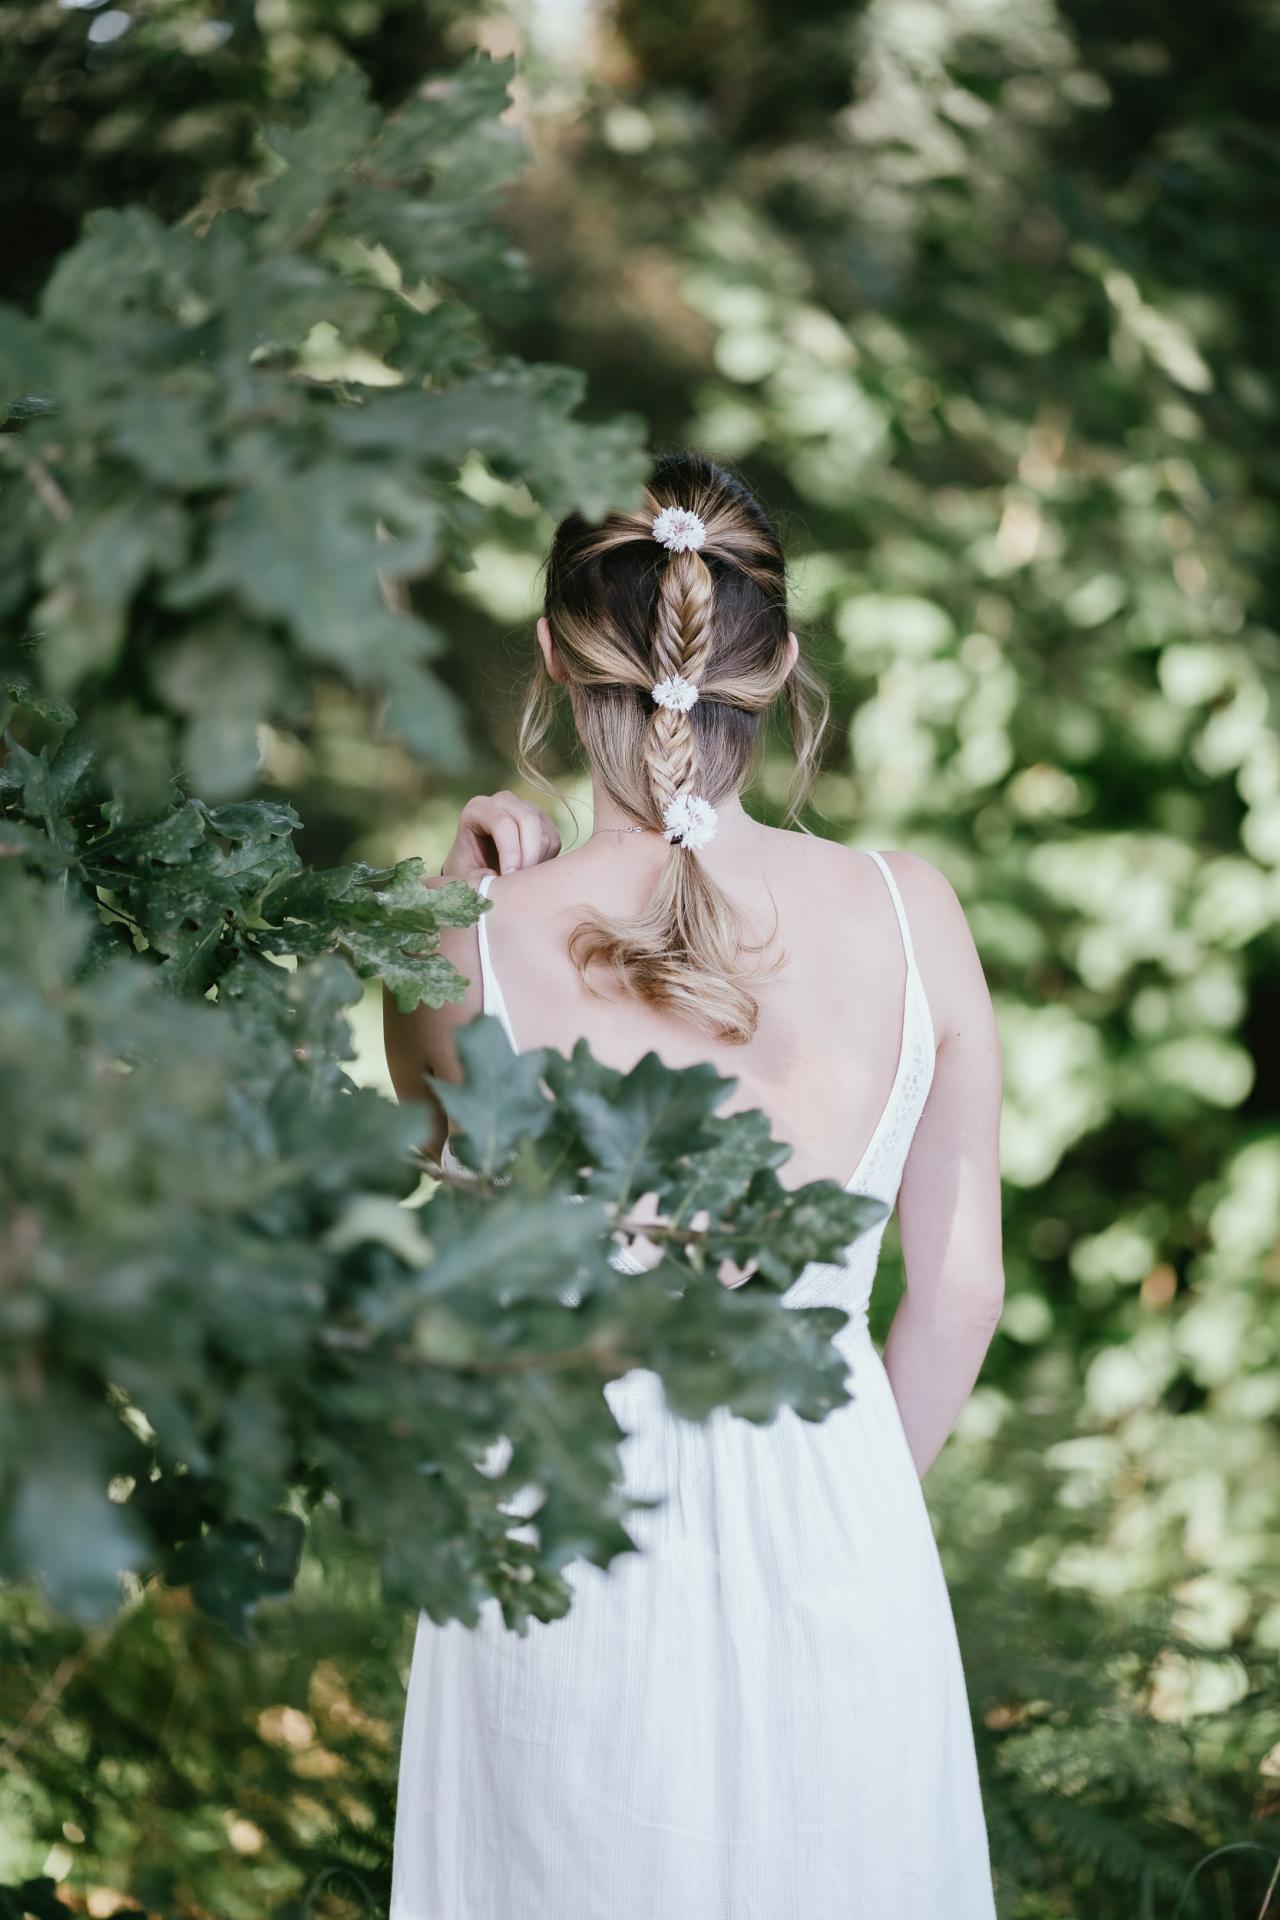 Photographe de mariage moody boho chic boheme dax landes aquitaine fineart 2